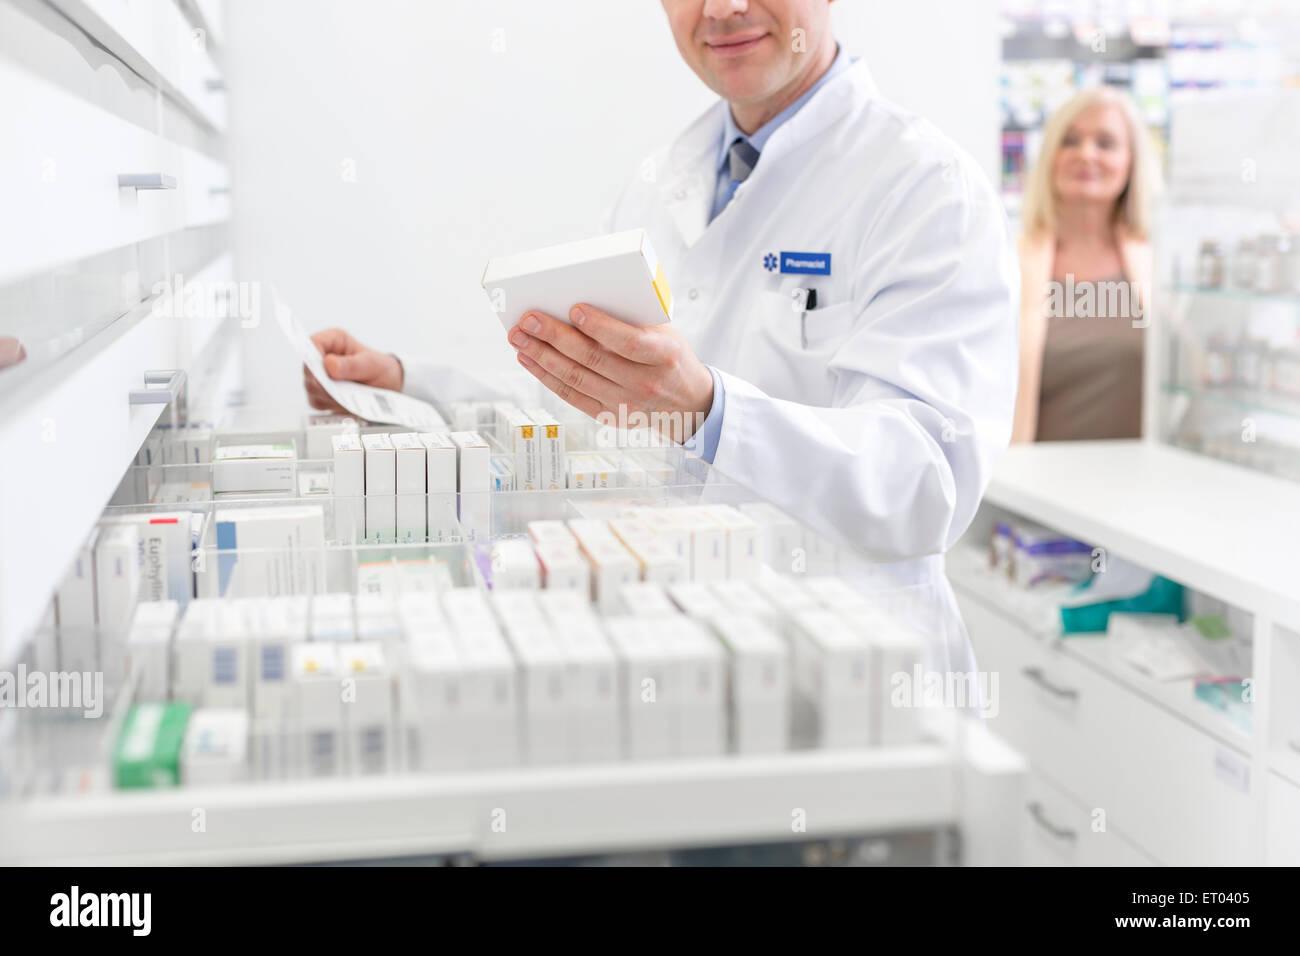 Pharmacist filling prescription in pharmacy - Stock Image